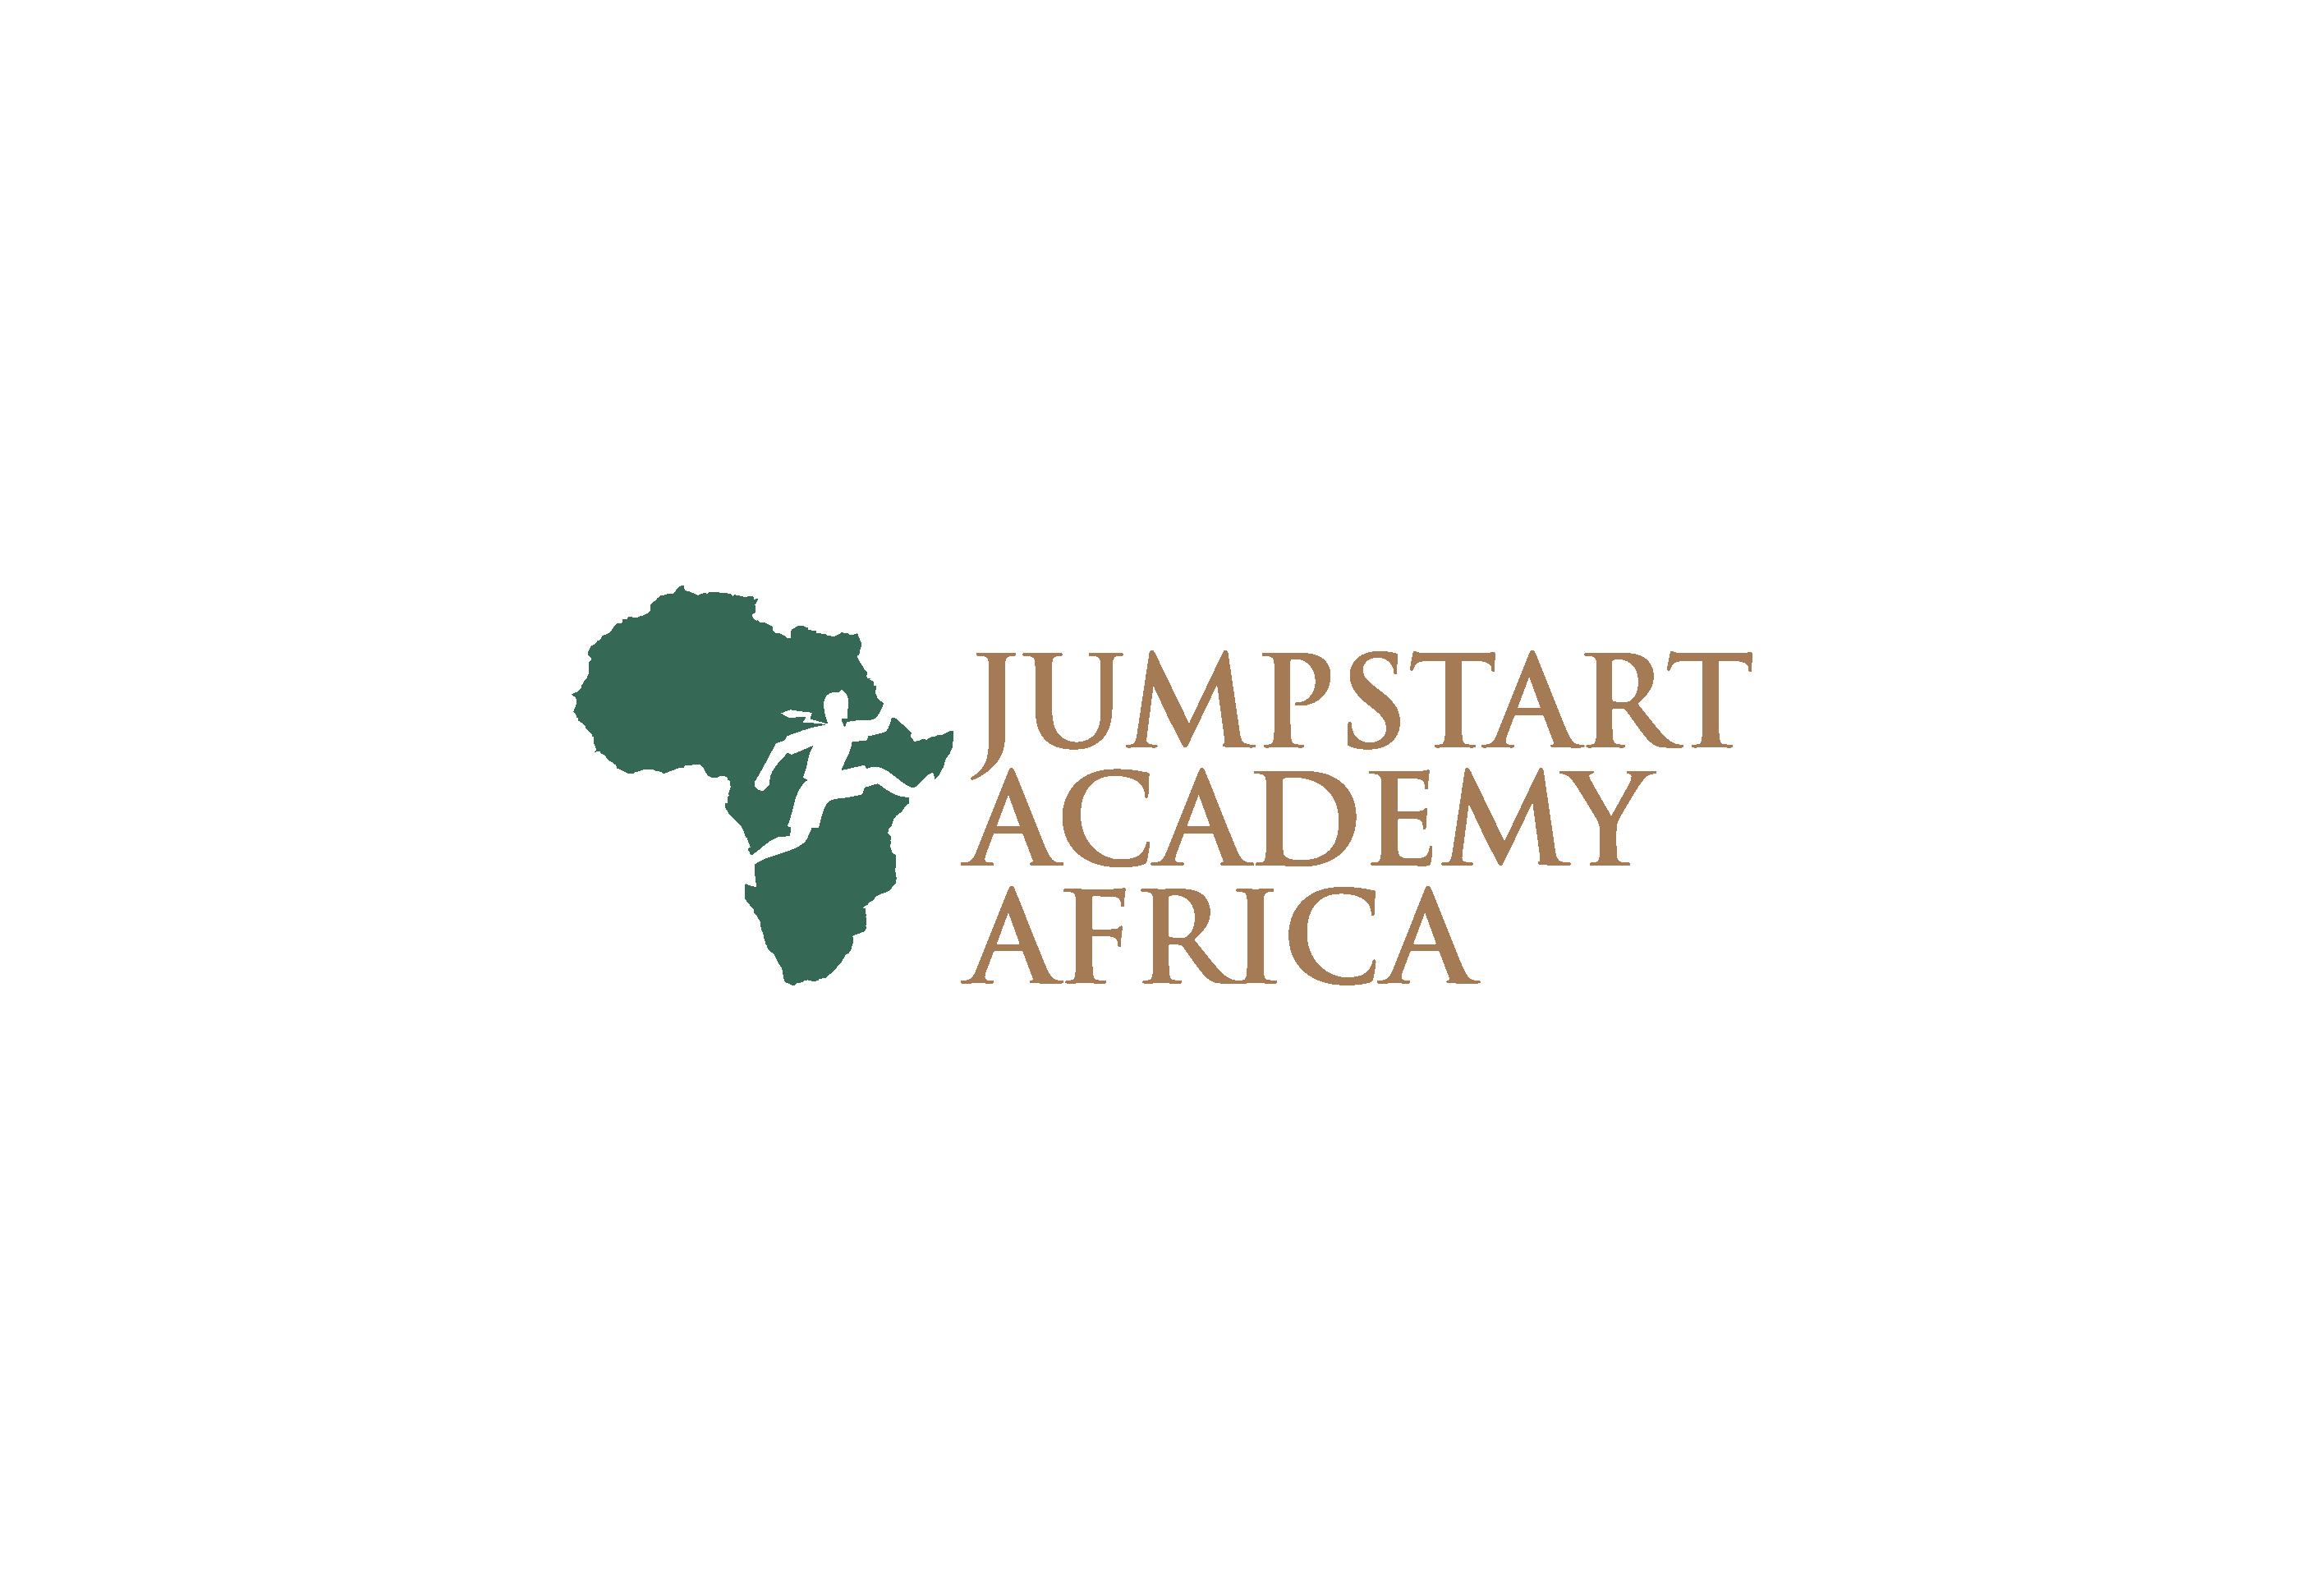 Jumpstart Academy Africa